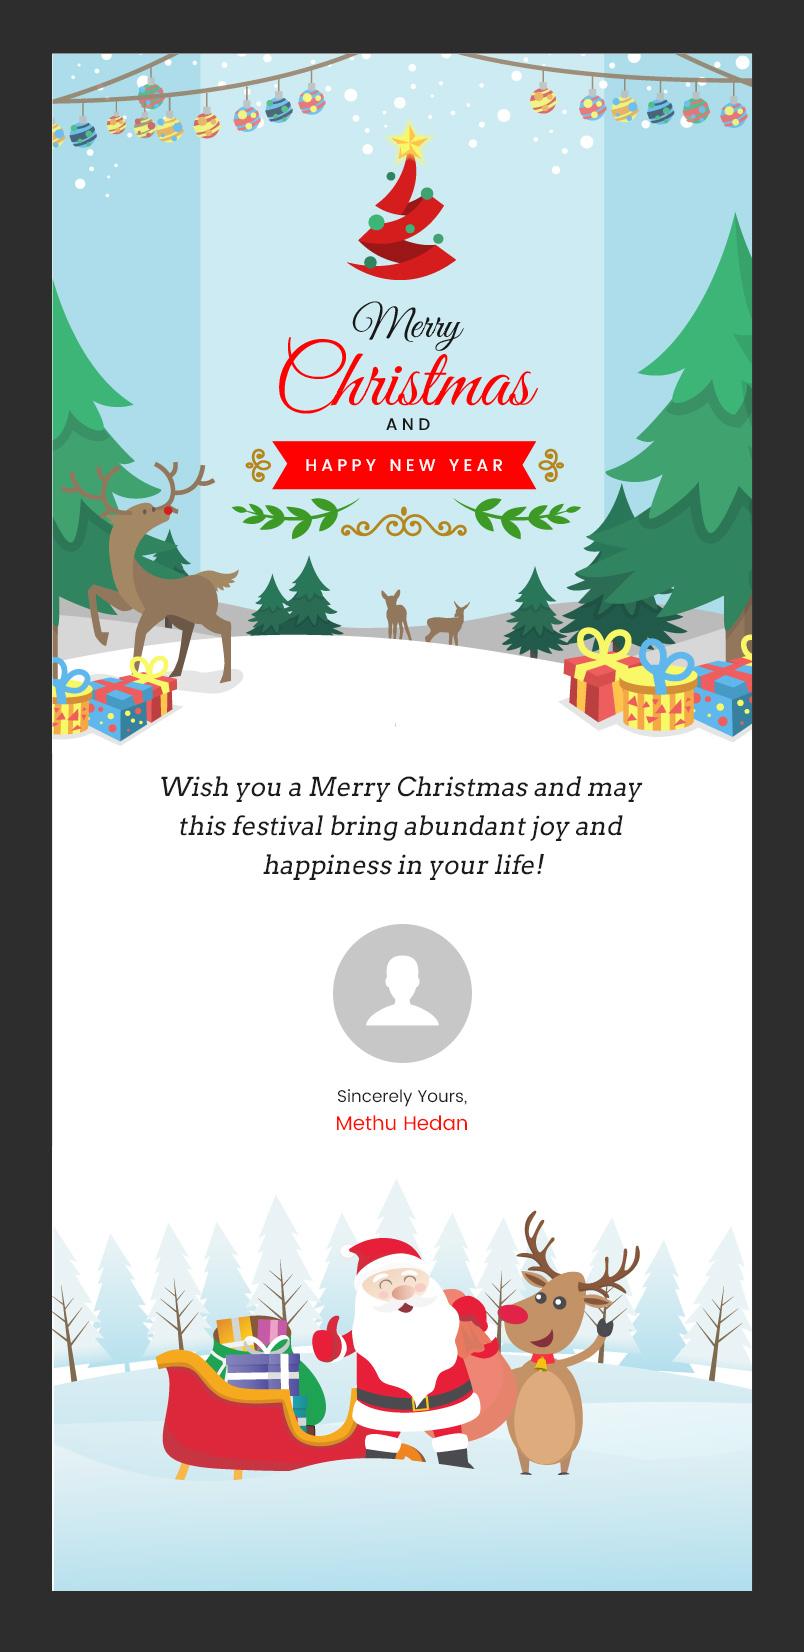 Merry christmas email template tikiritschule pegasus merry christmas email template m4hsunfo